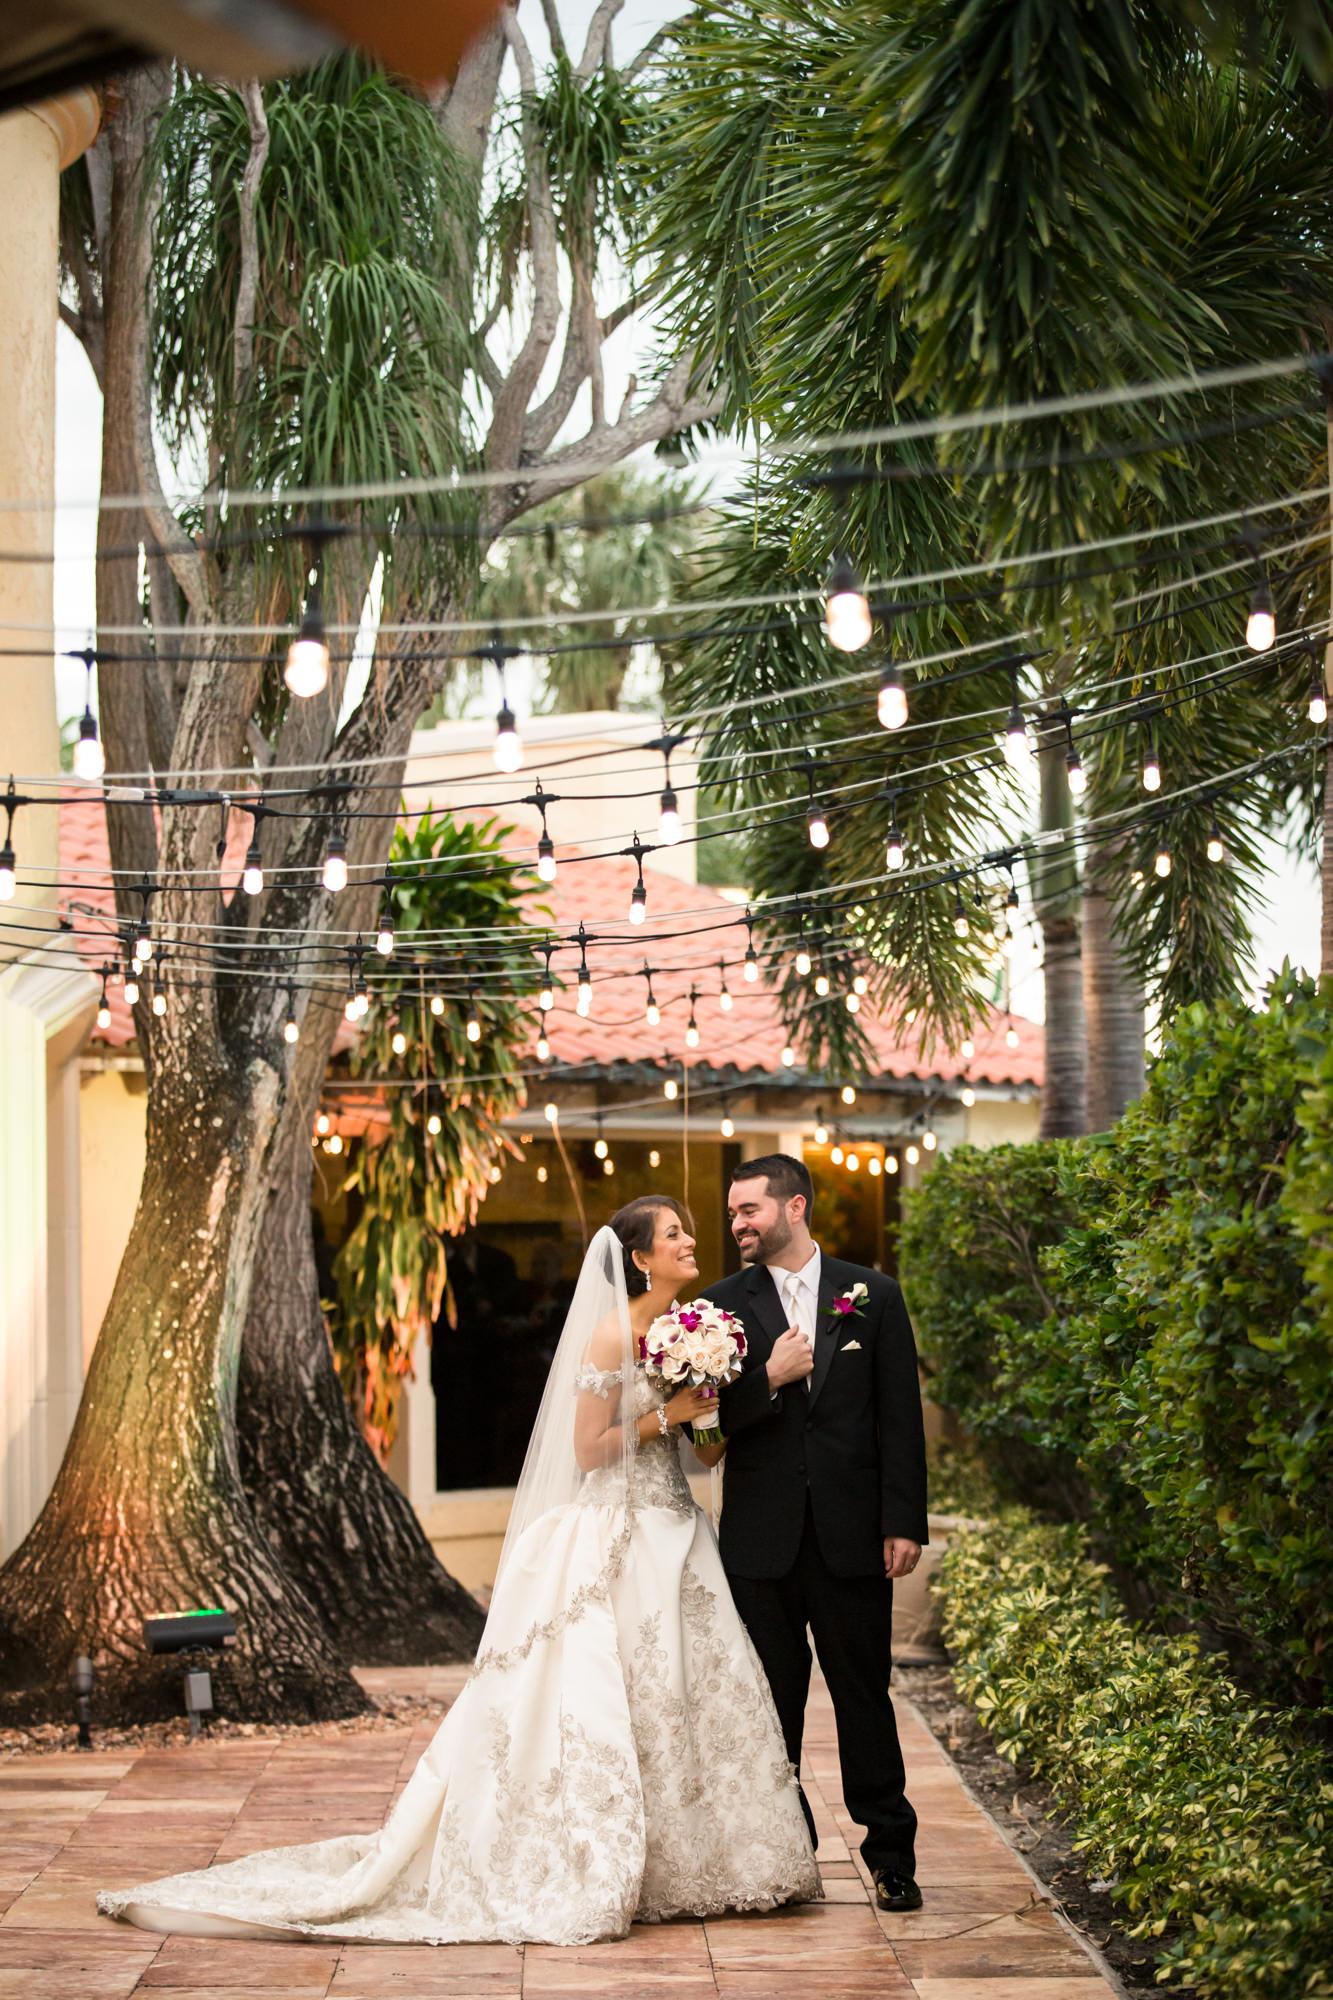 Benvenuto_Wedding_catholic_Florida_Bride-Groom-93.jpg